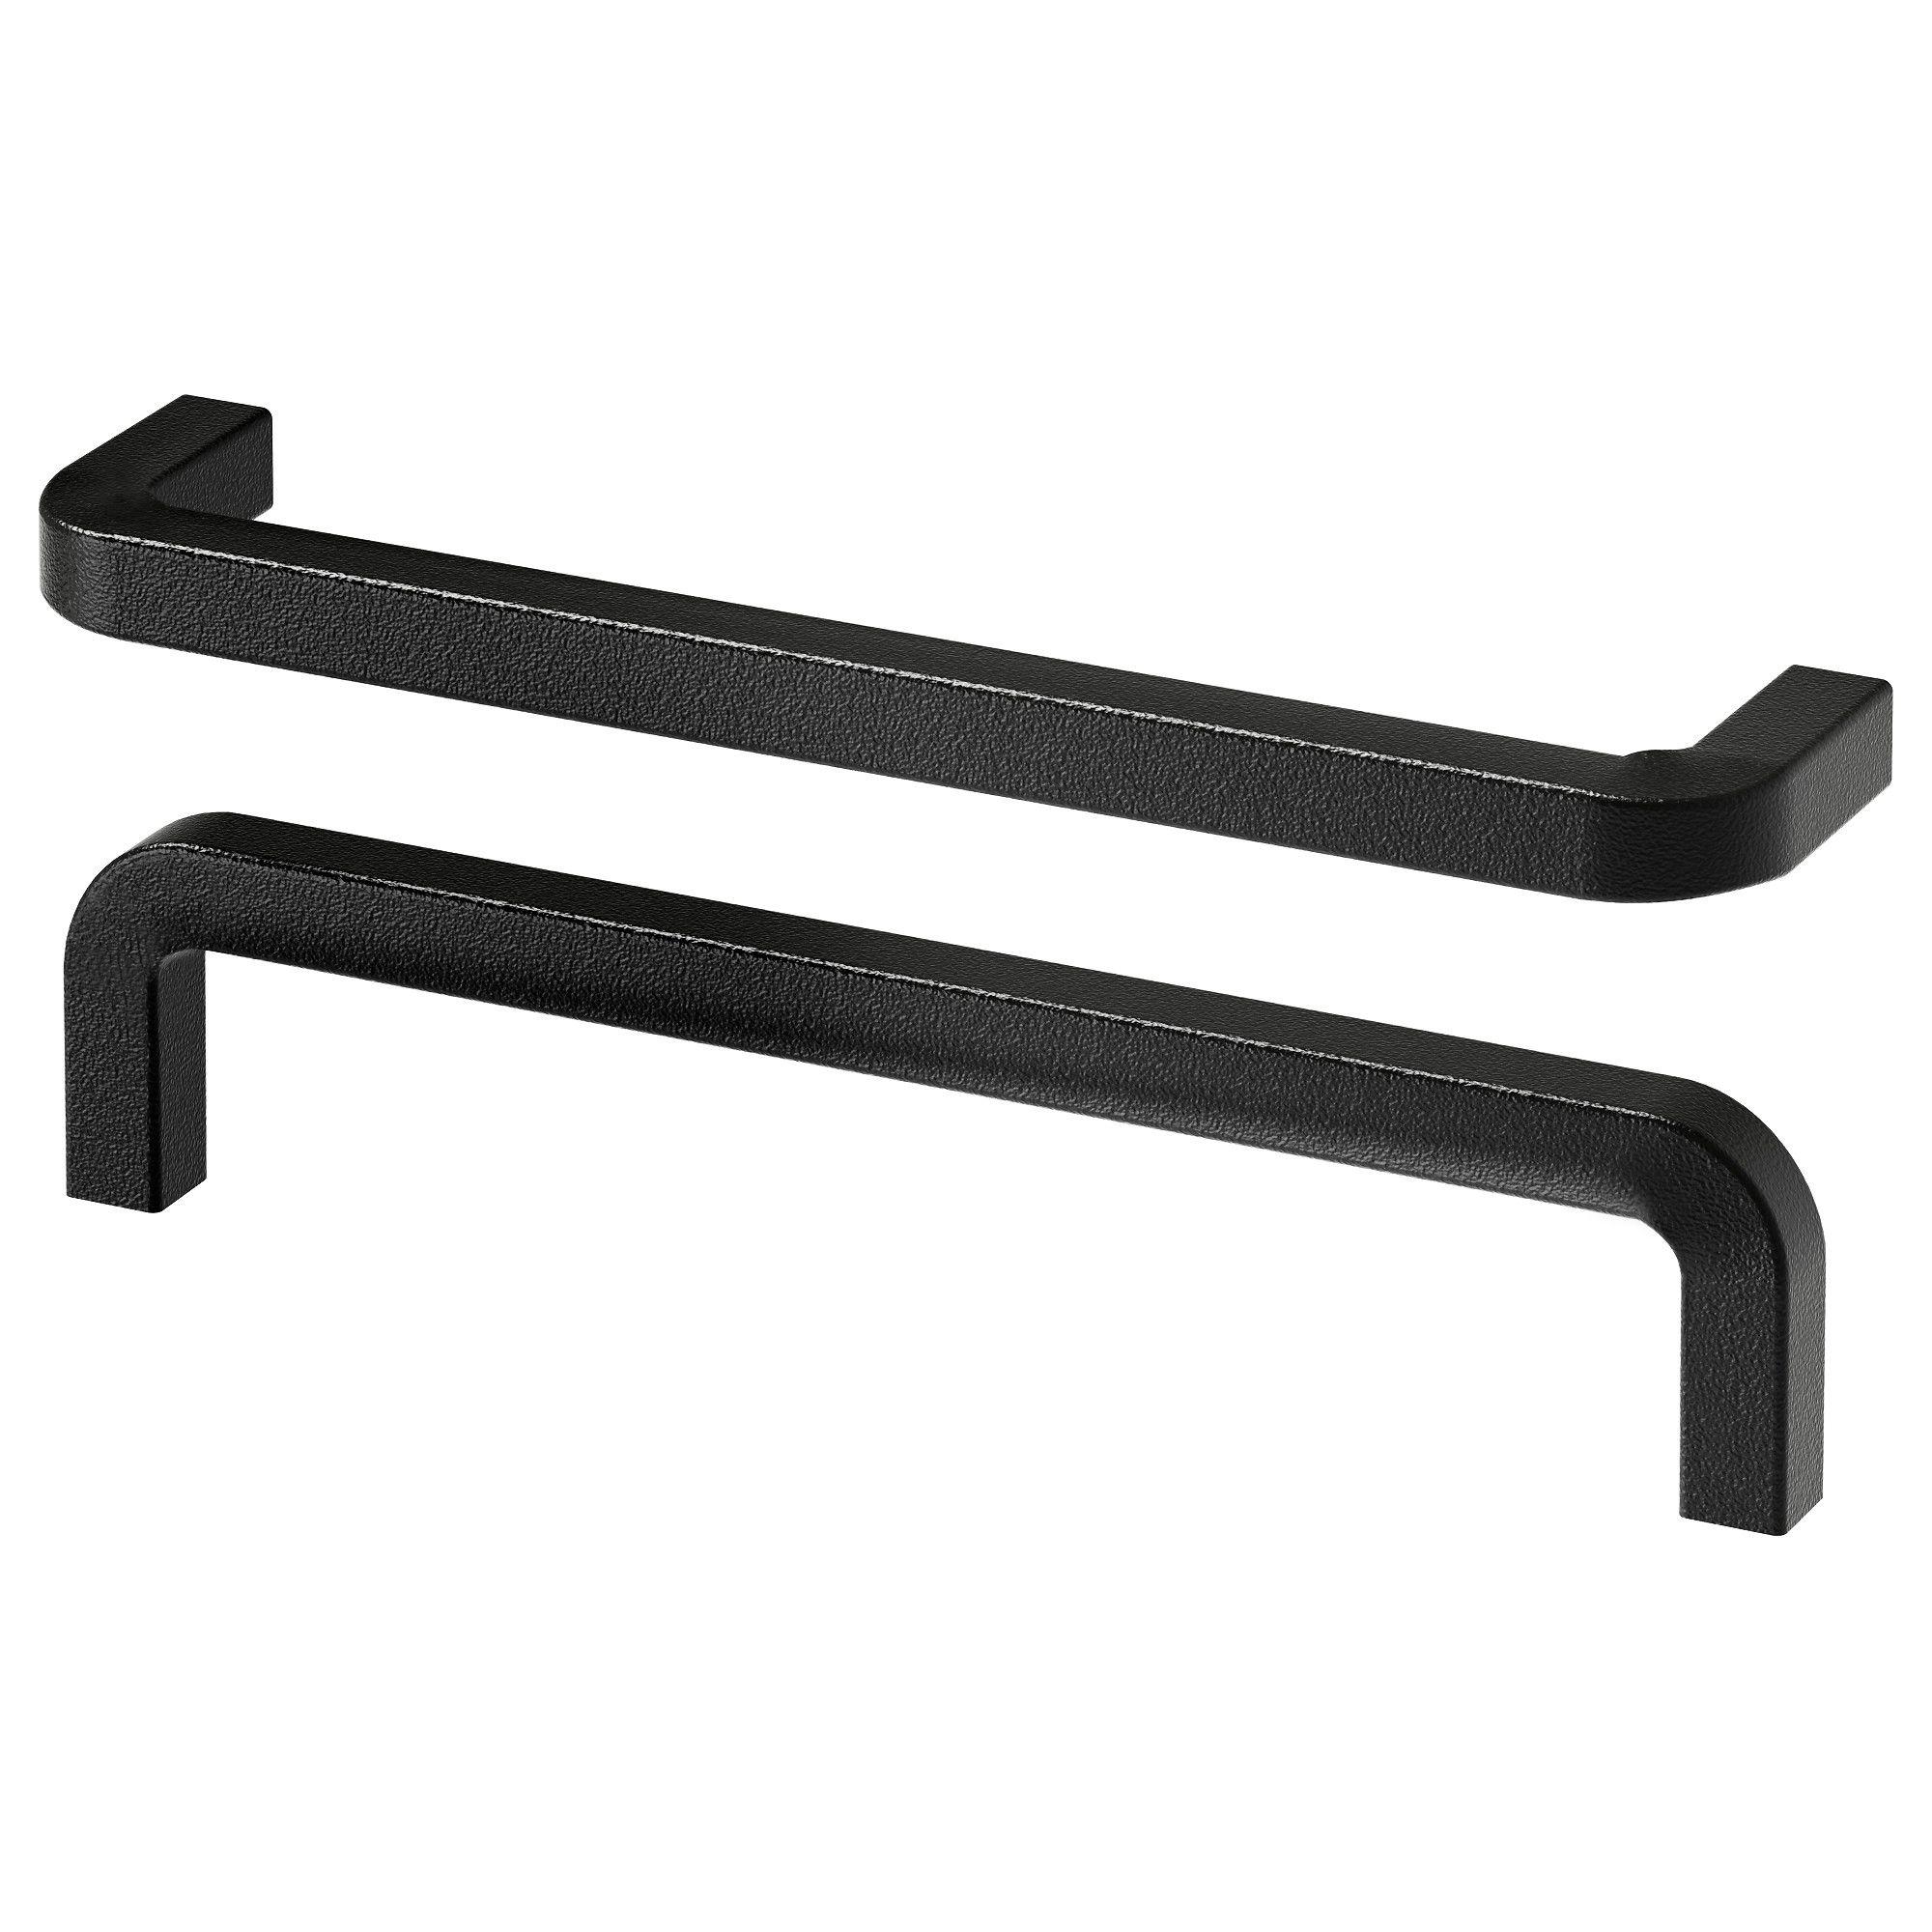 Ikea Kitchen Cabinet Handles: IKEA BORGHAMN Handle